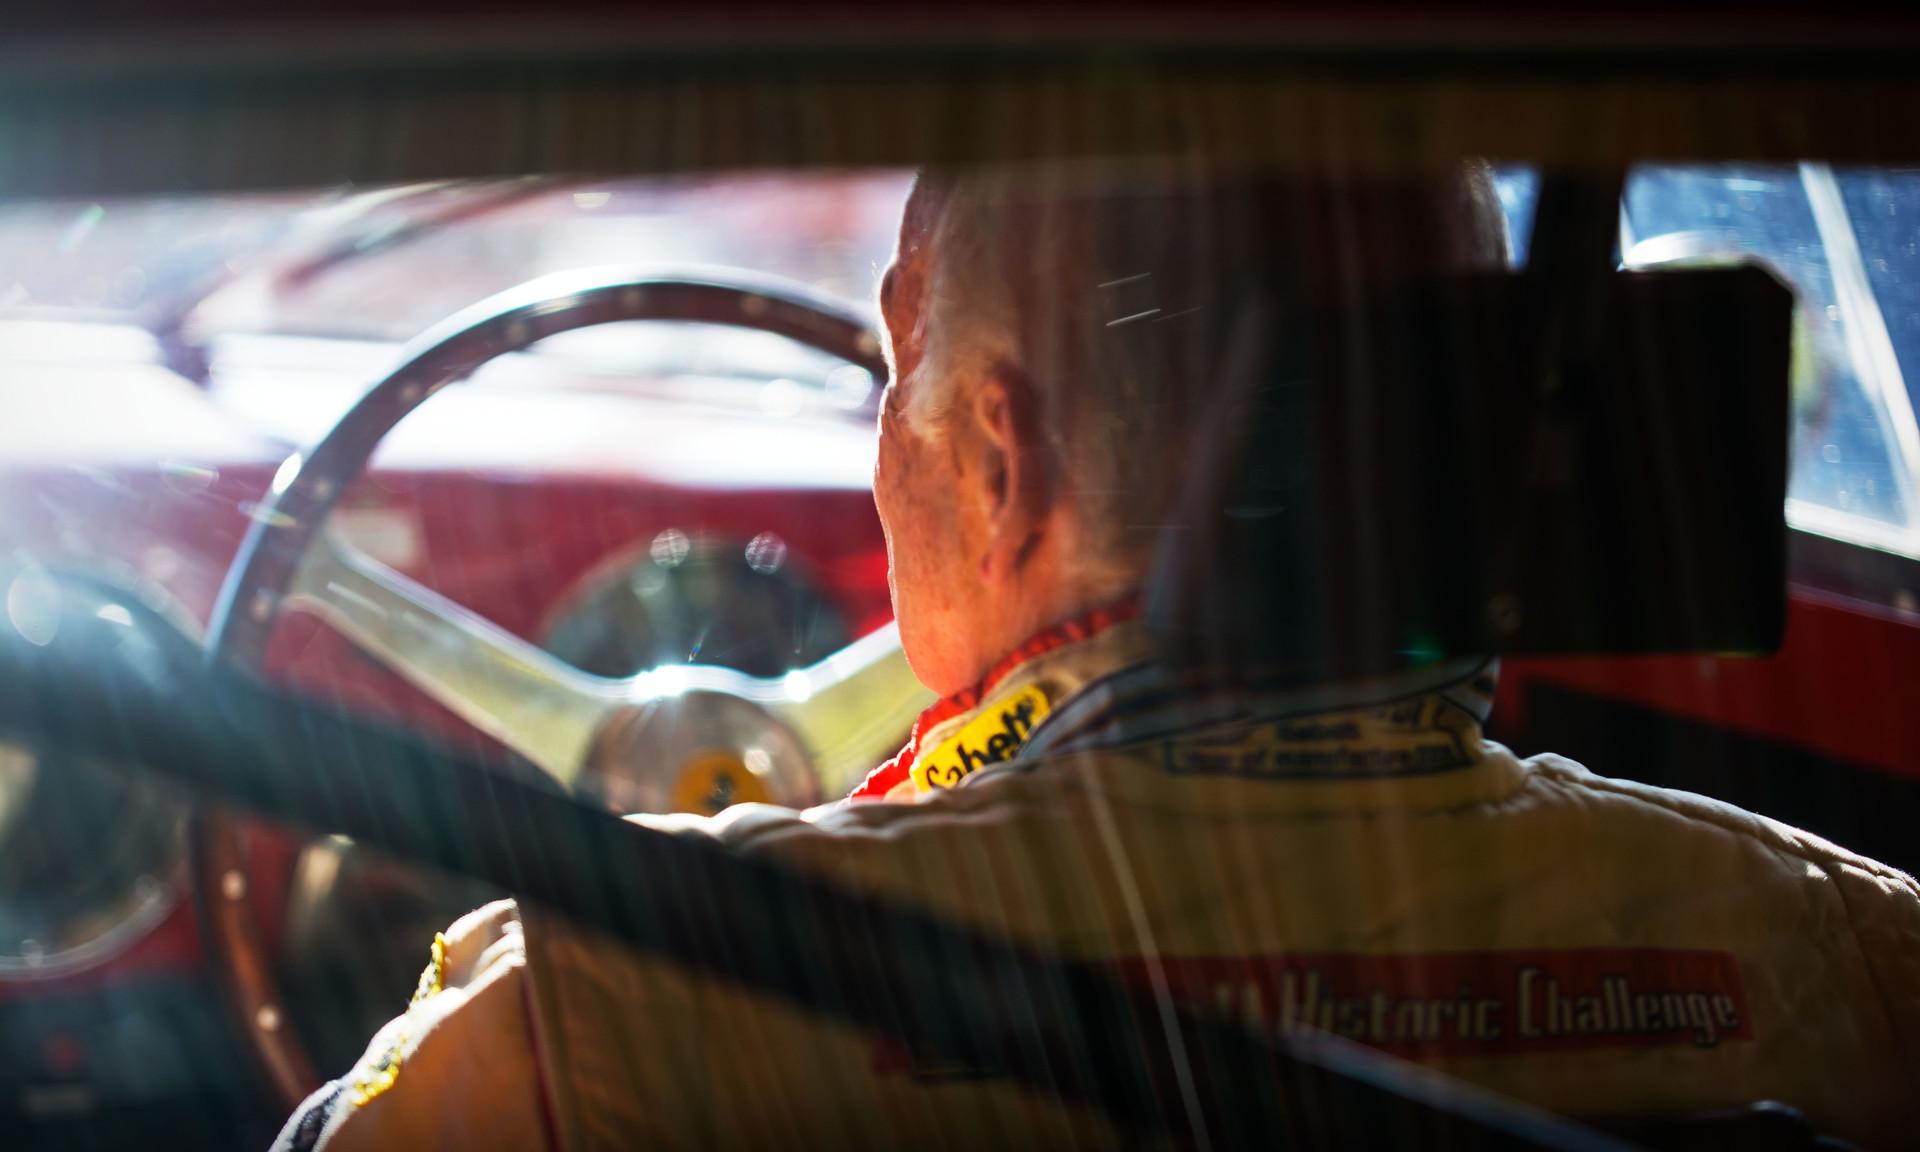 David Franklin in Arnold Meier's 1952 Ferrari 225S Vignale Berlinetta